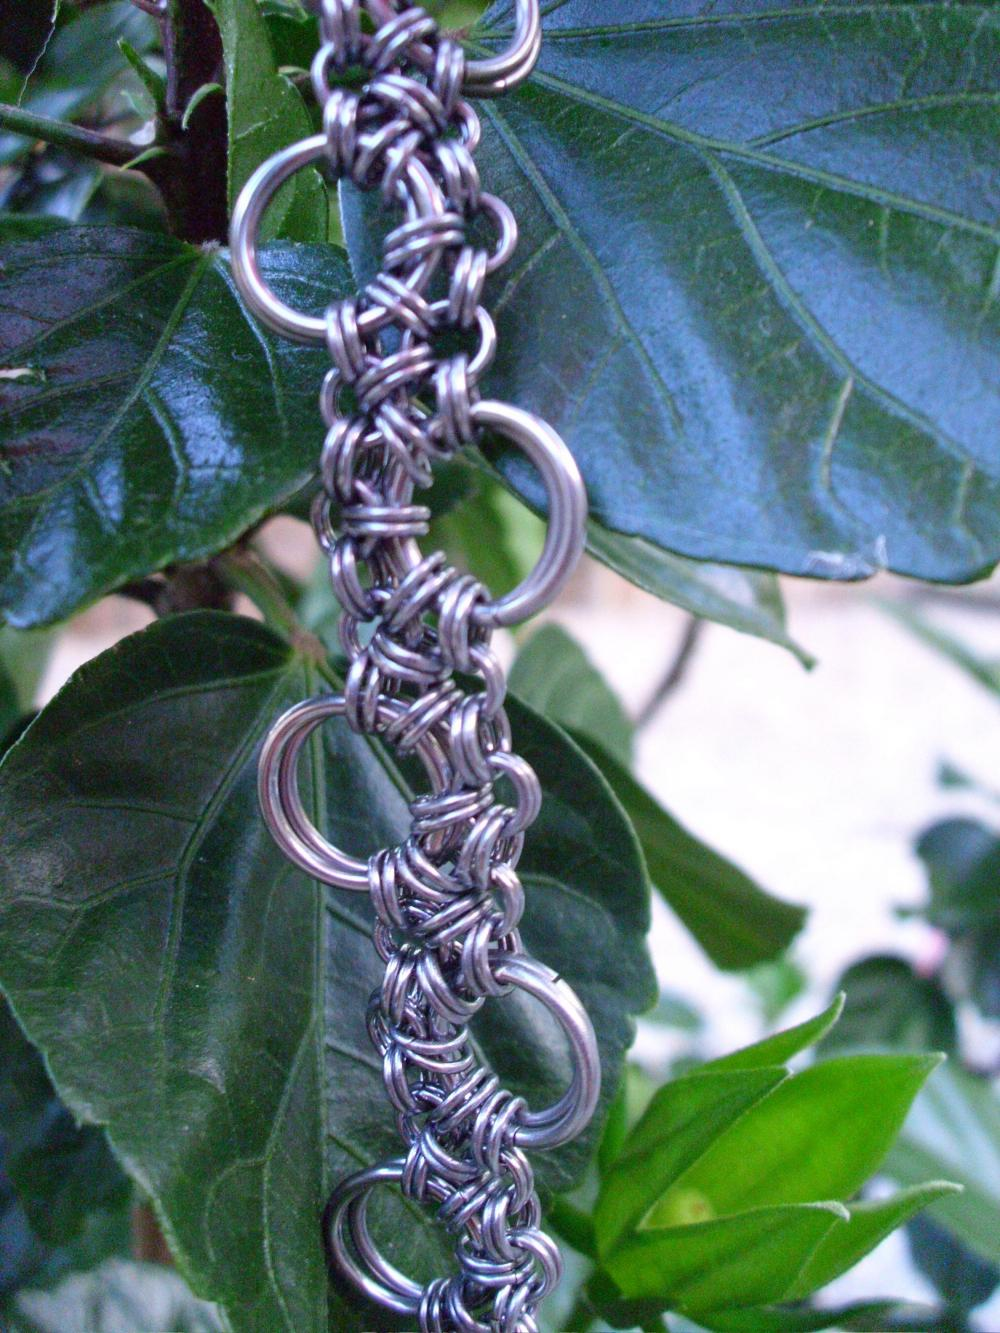 Stainless Steel Sidewalk Chain Chainmail Bracelet